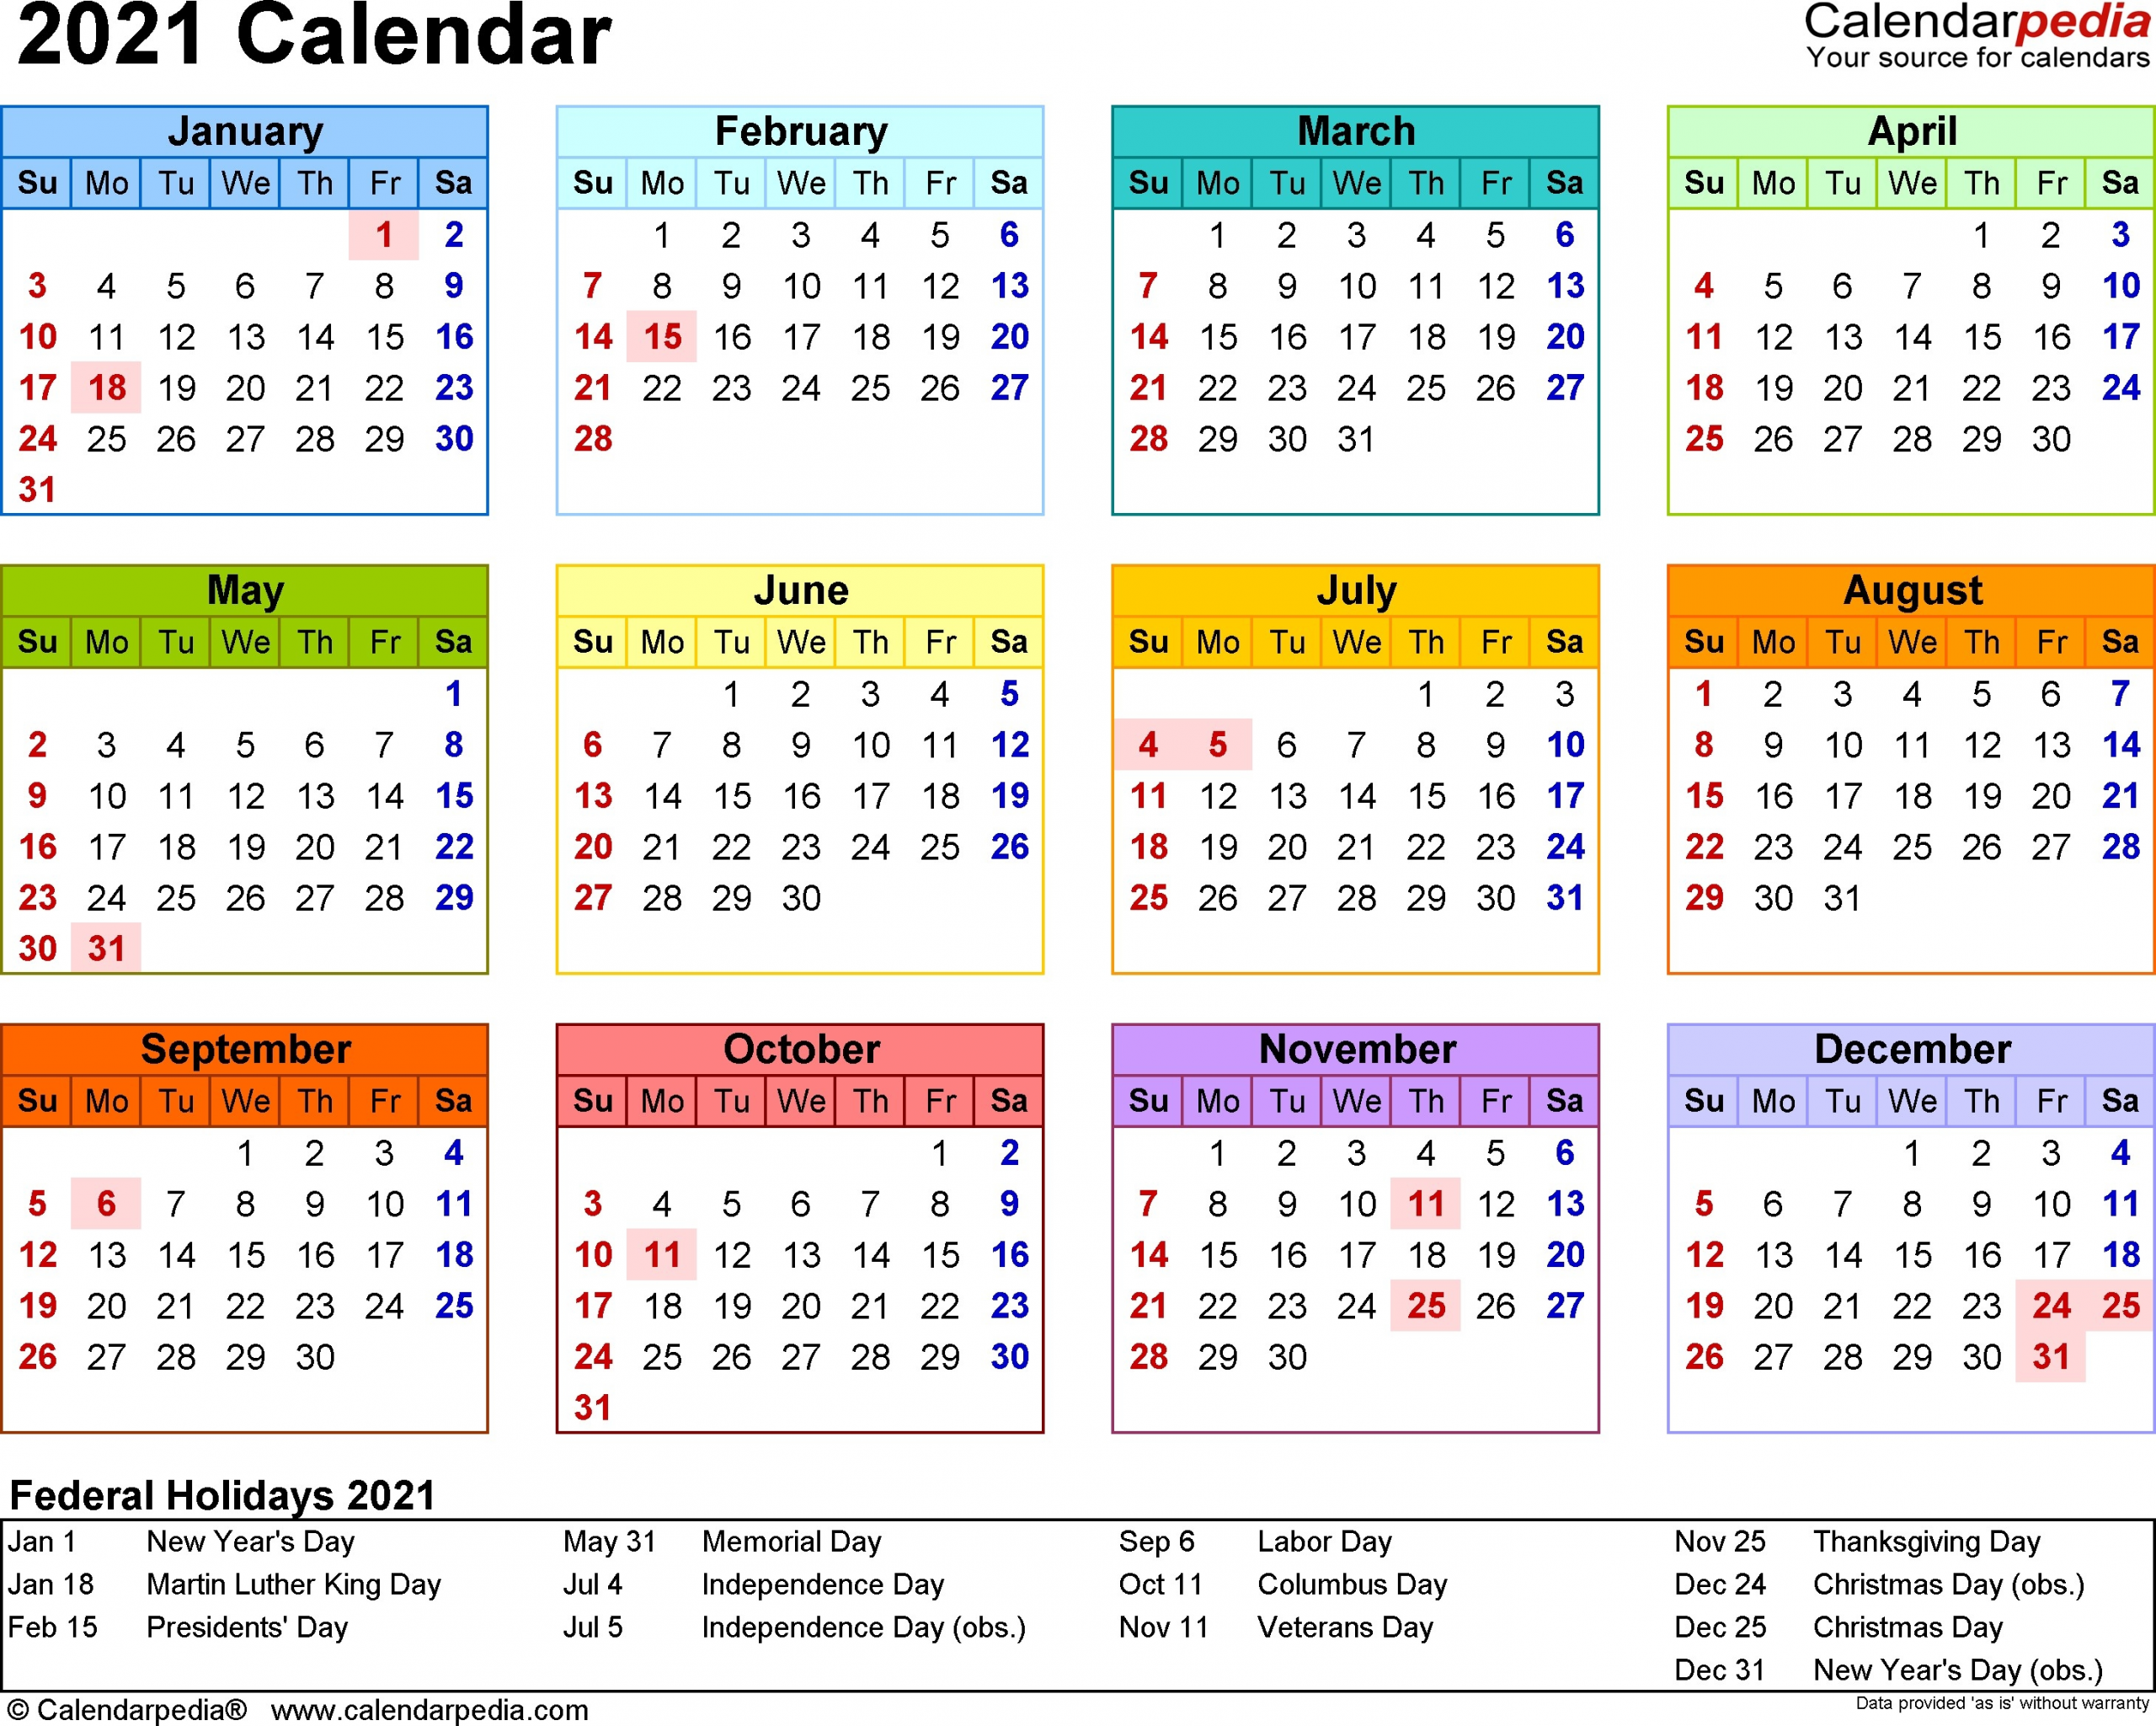 2021 calendar template 3 year calendar full page | free